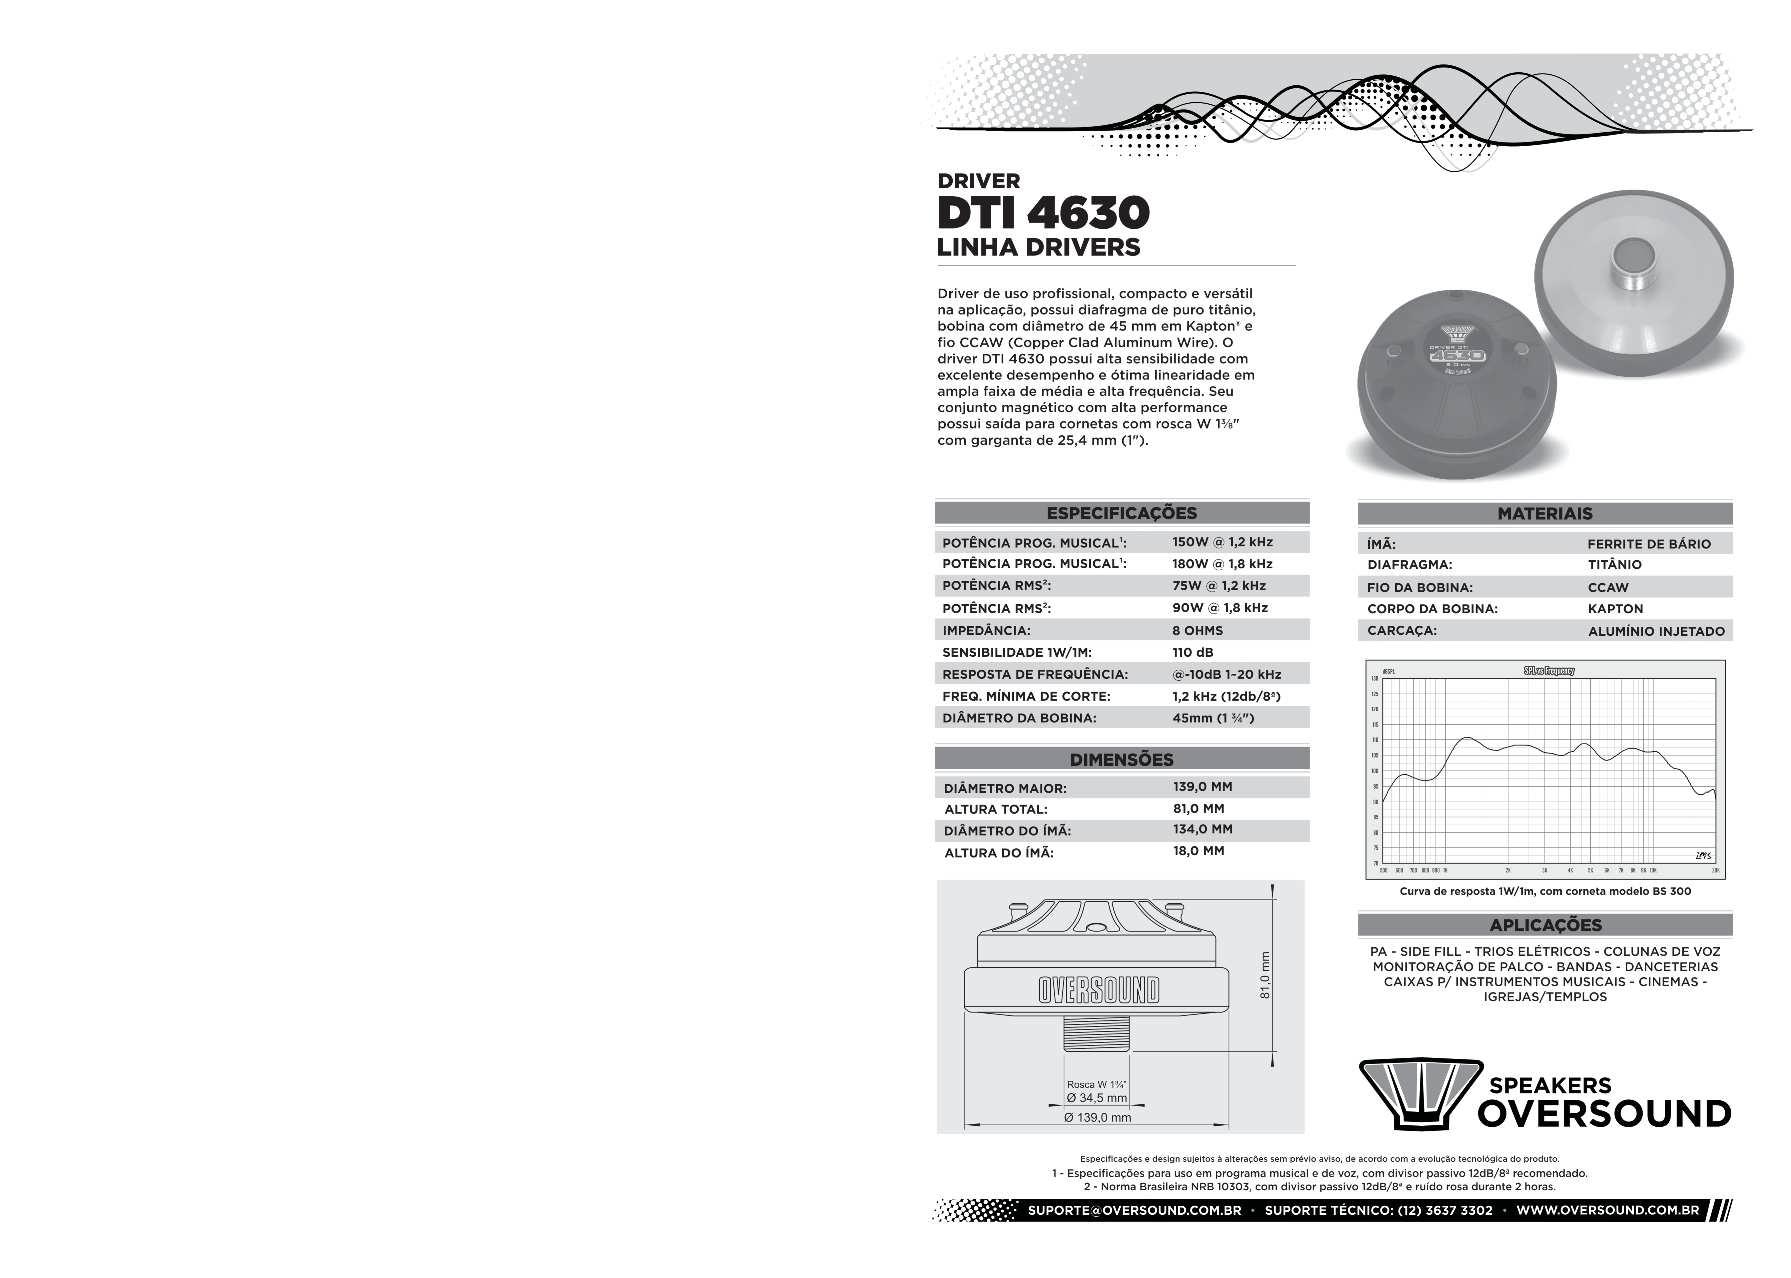 Driver DTI 4630 - Oversound  - RS Som e Luz!